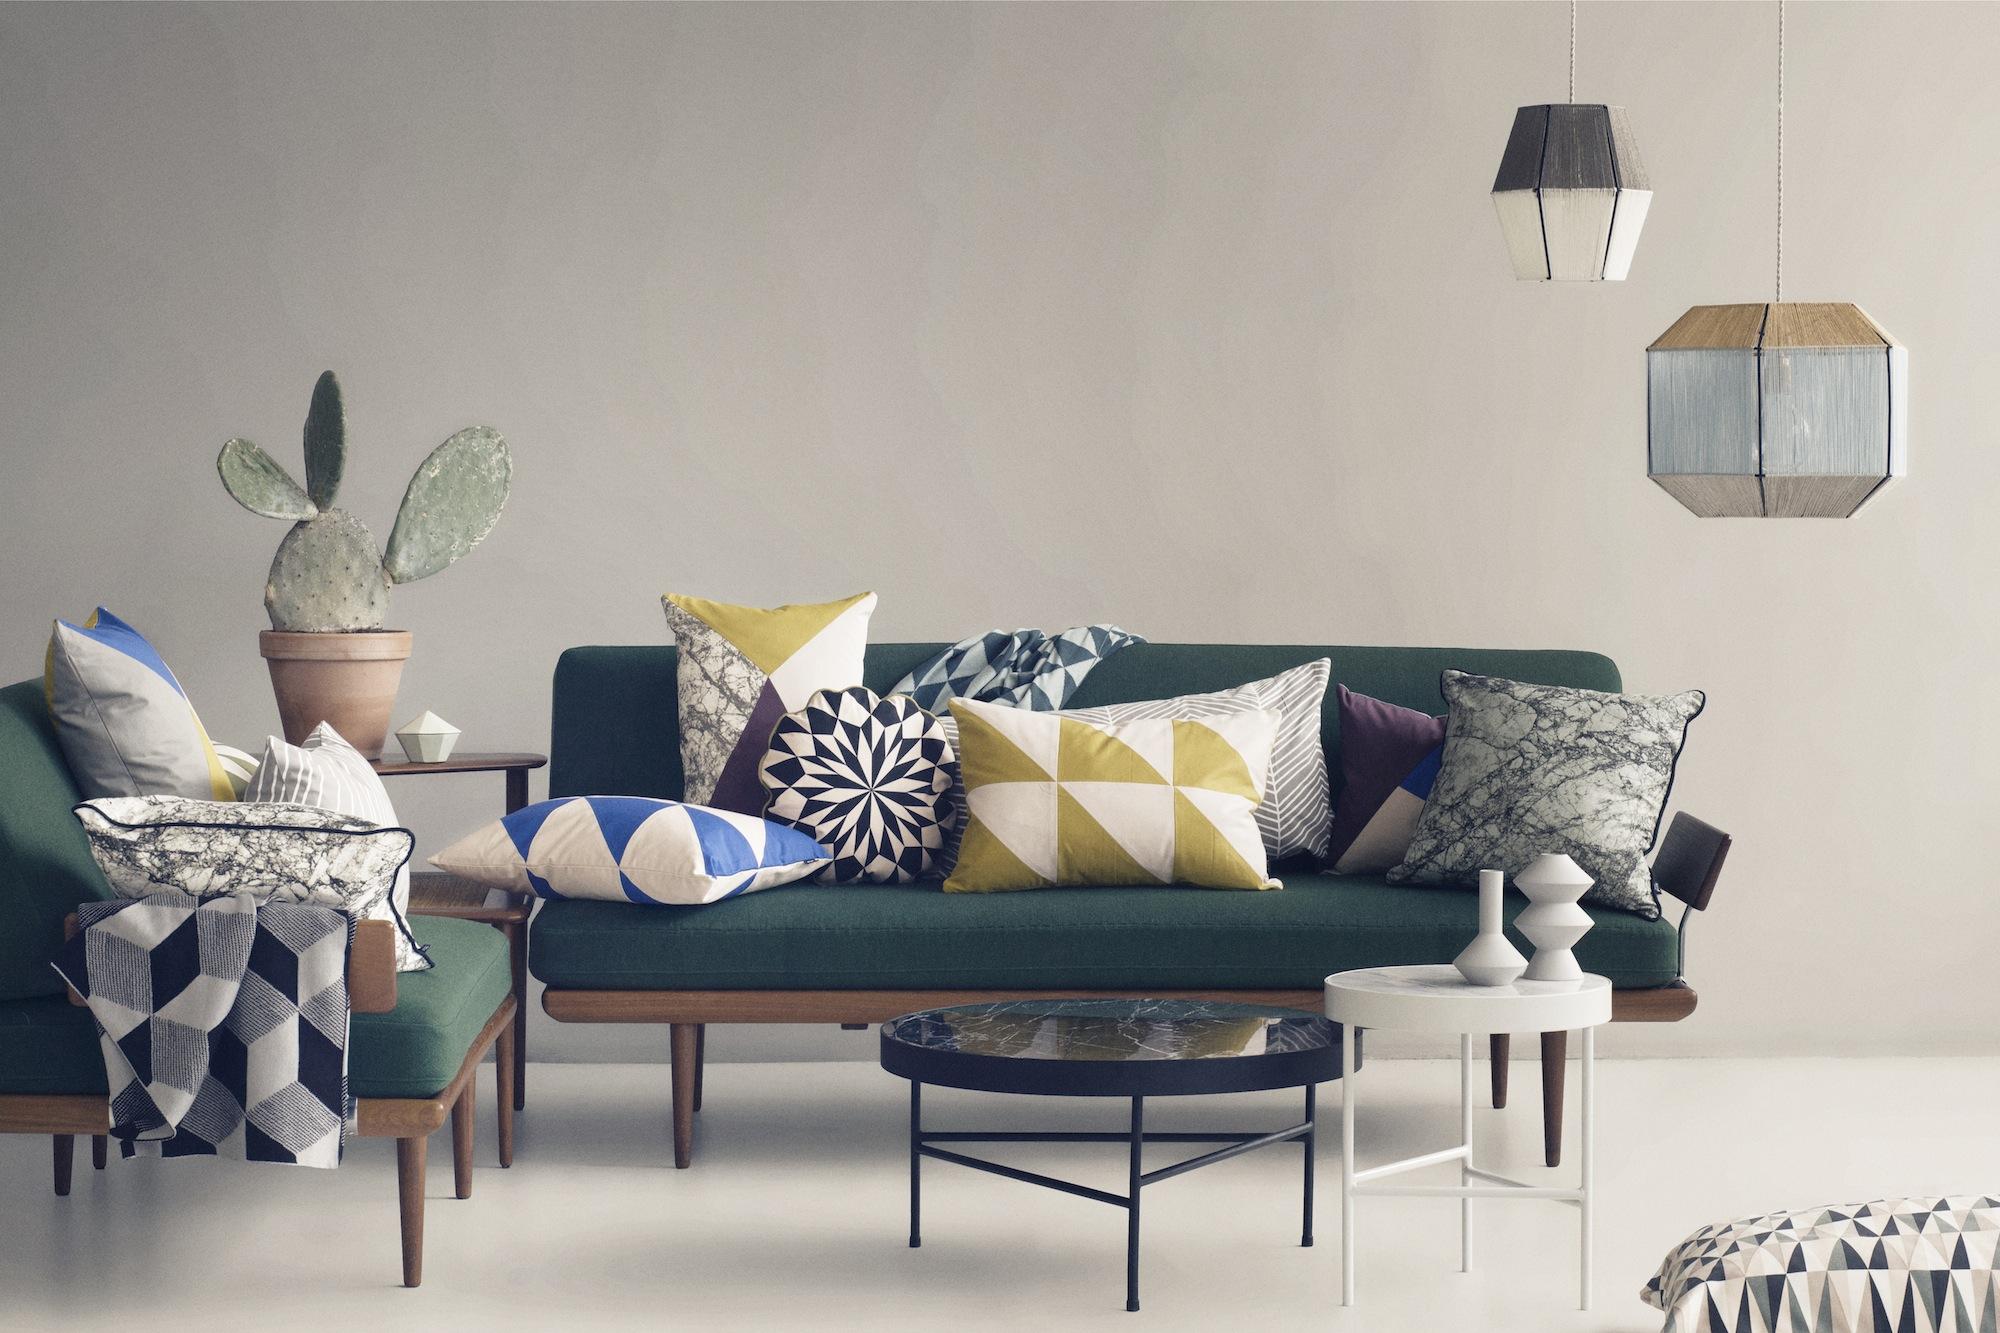 Ferm Living A W 2014 Collection Avenue Lifestyle Avenue Lifestyle # Muebles Lifestyle